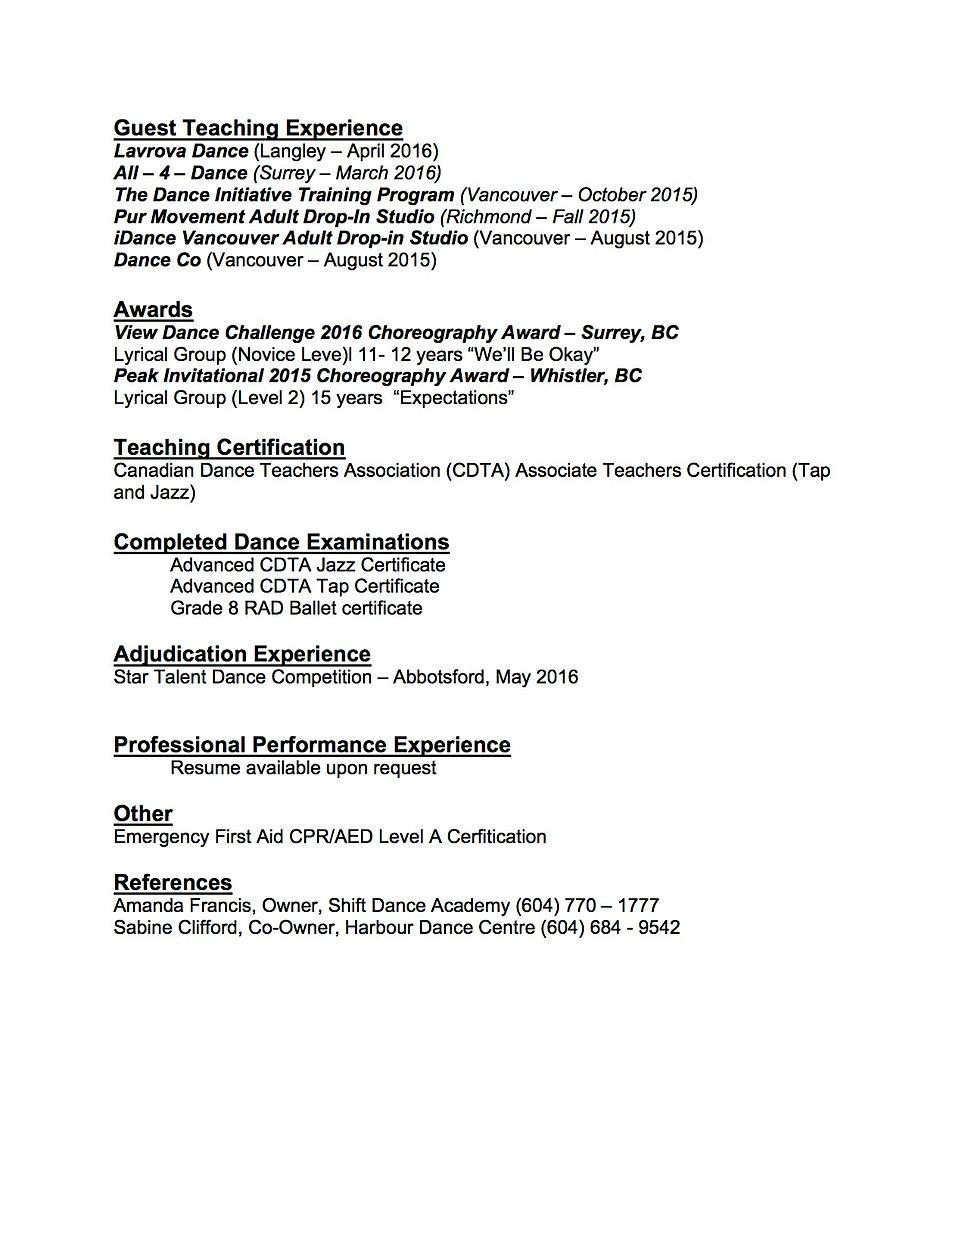 abbey dutton resume